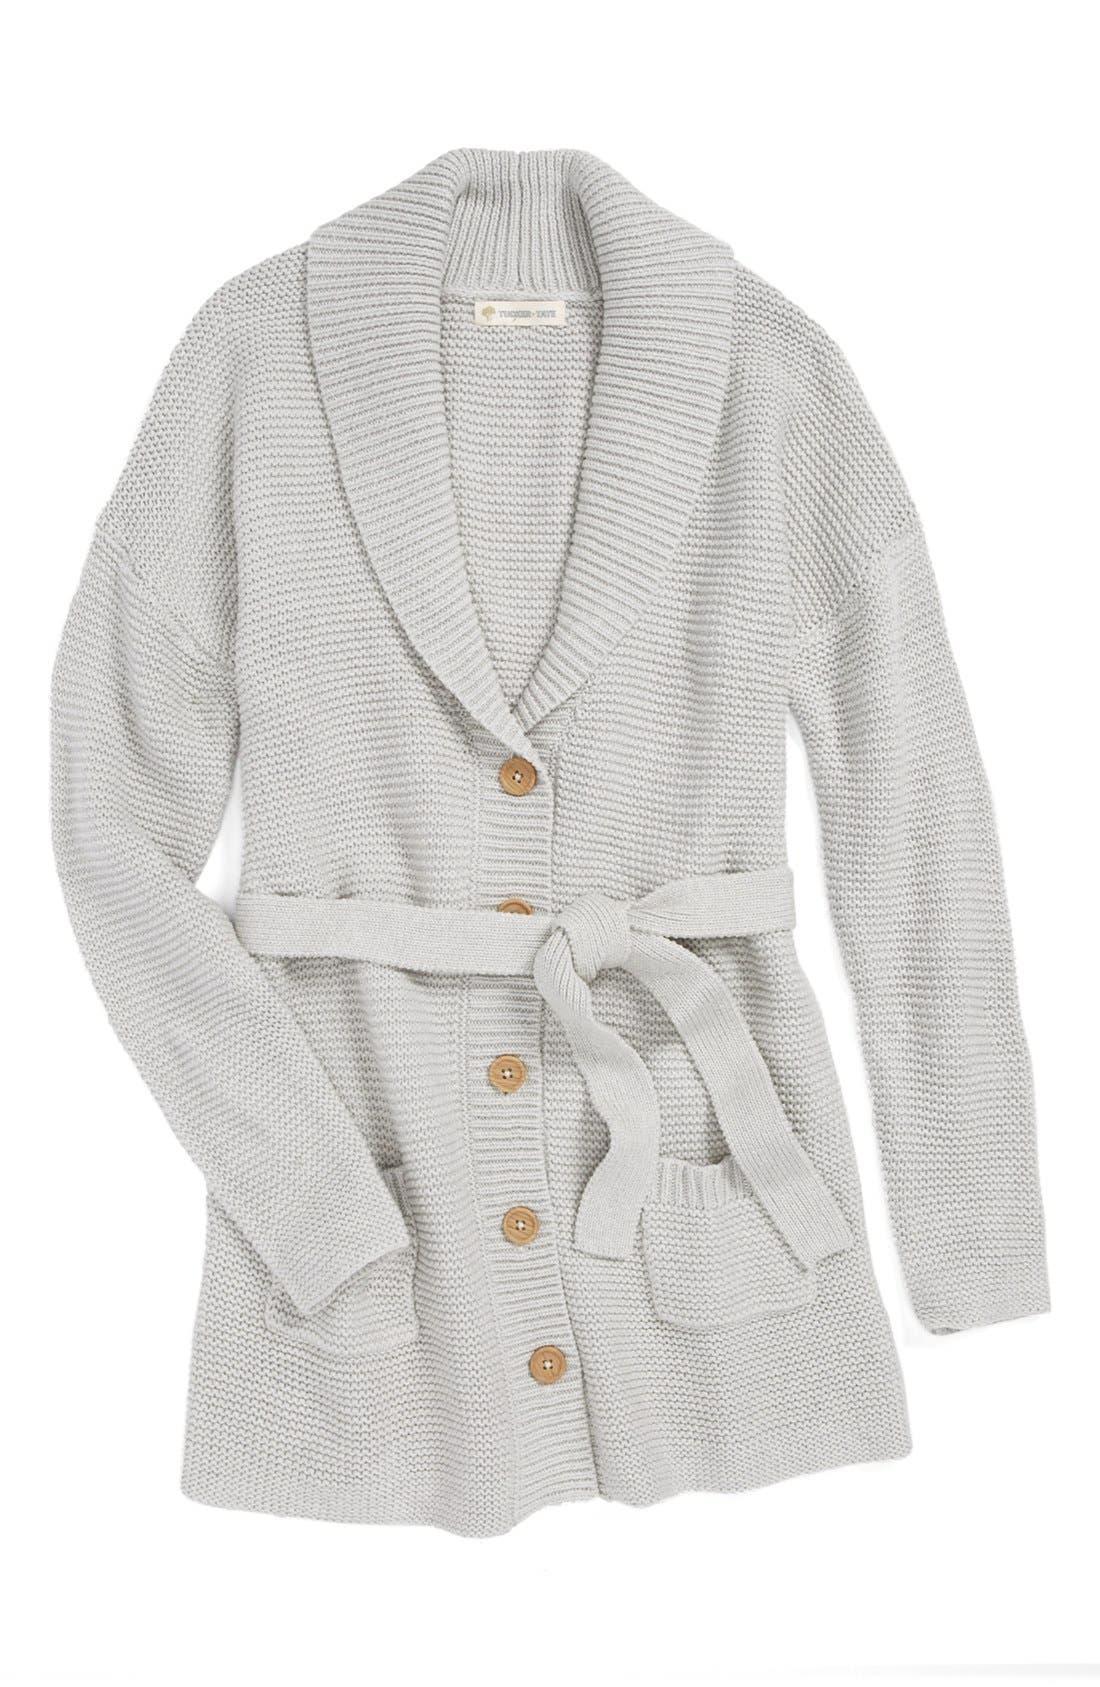 Alternate Image 1 Selected - Tucker + Tate 'Willow' Sweater Coat (Big Girls)